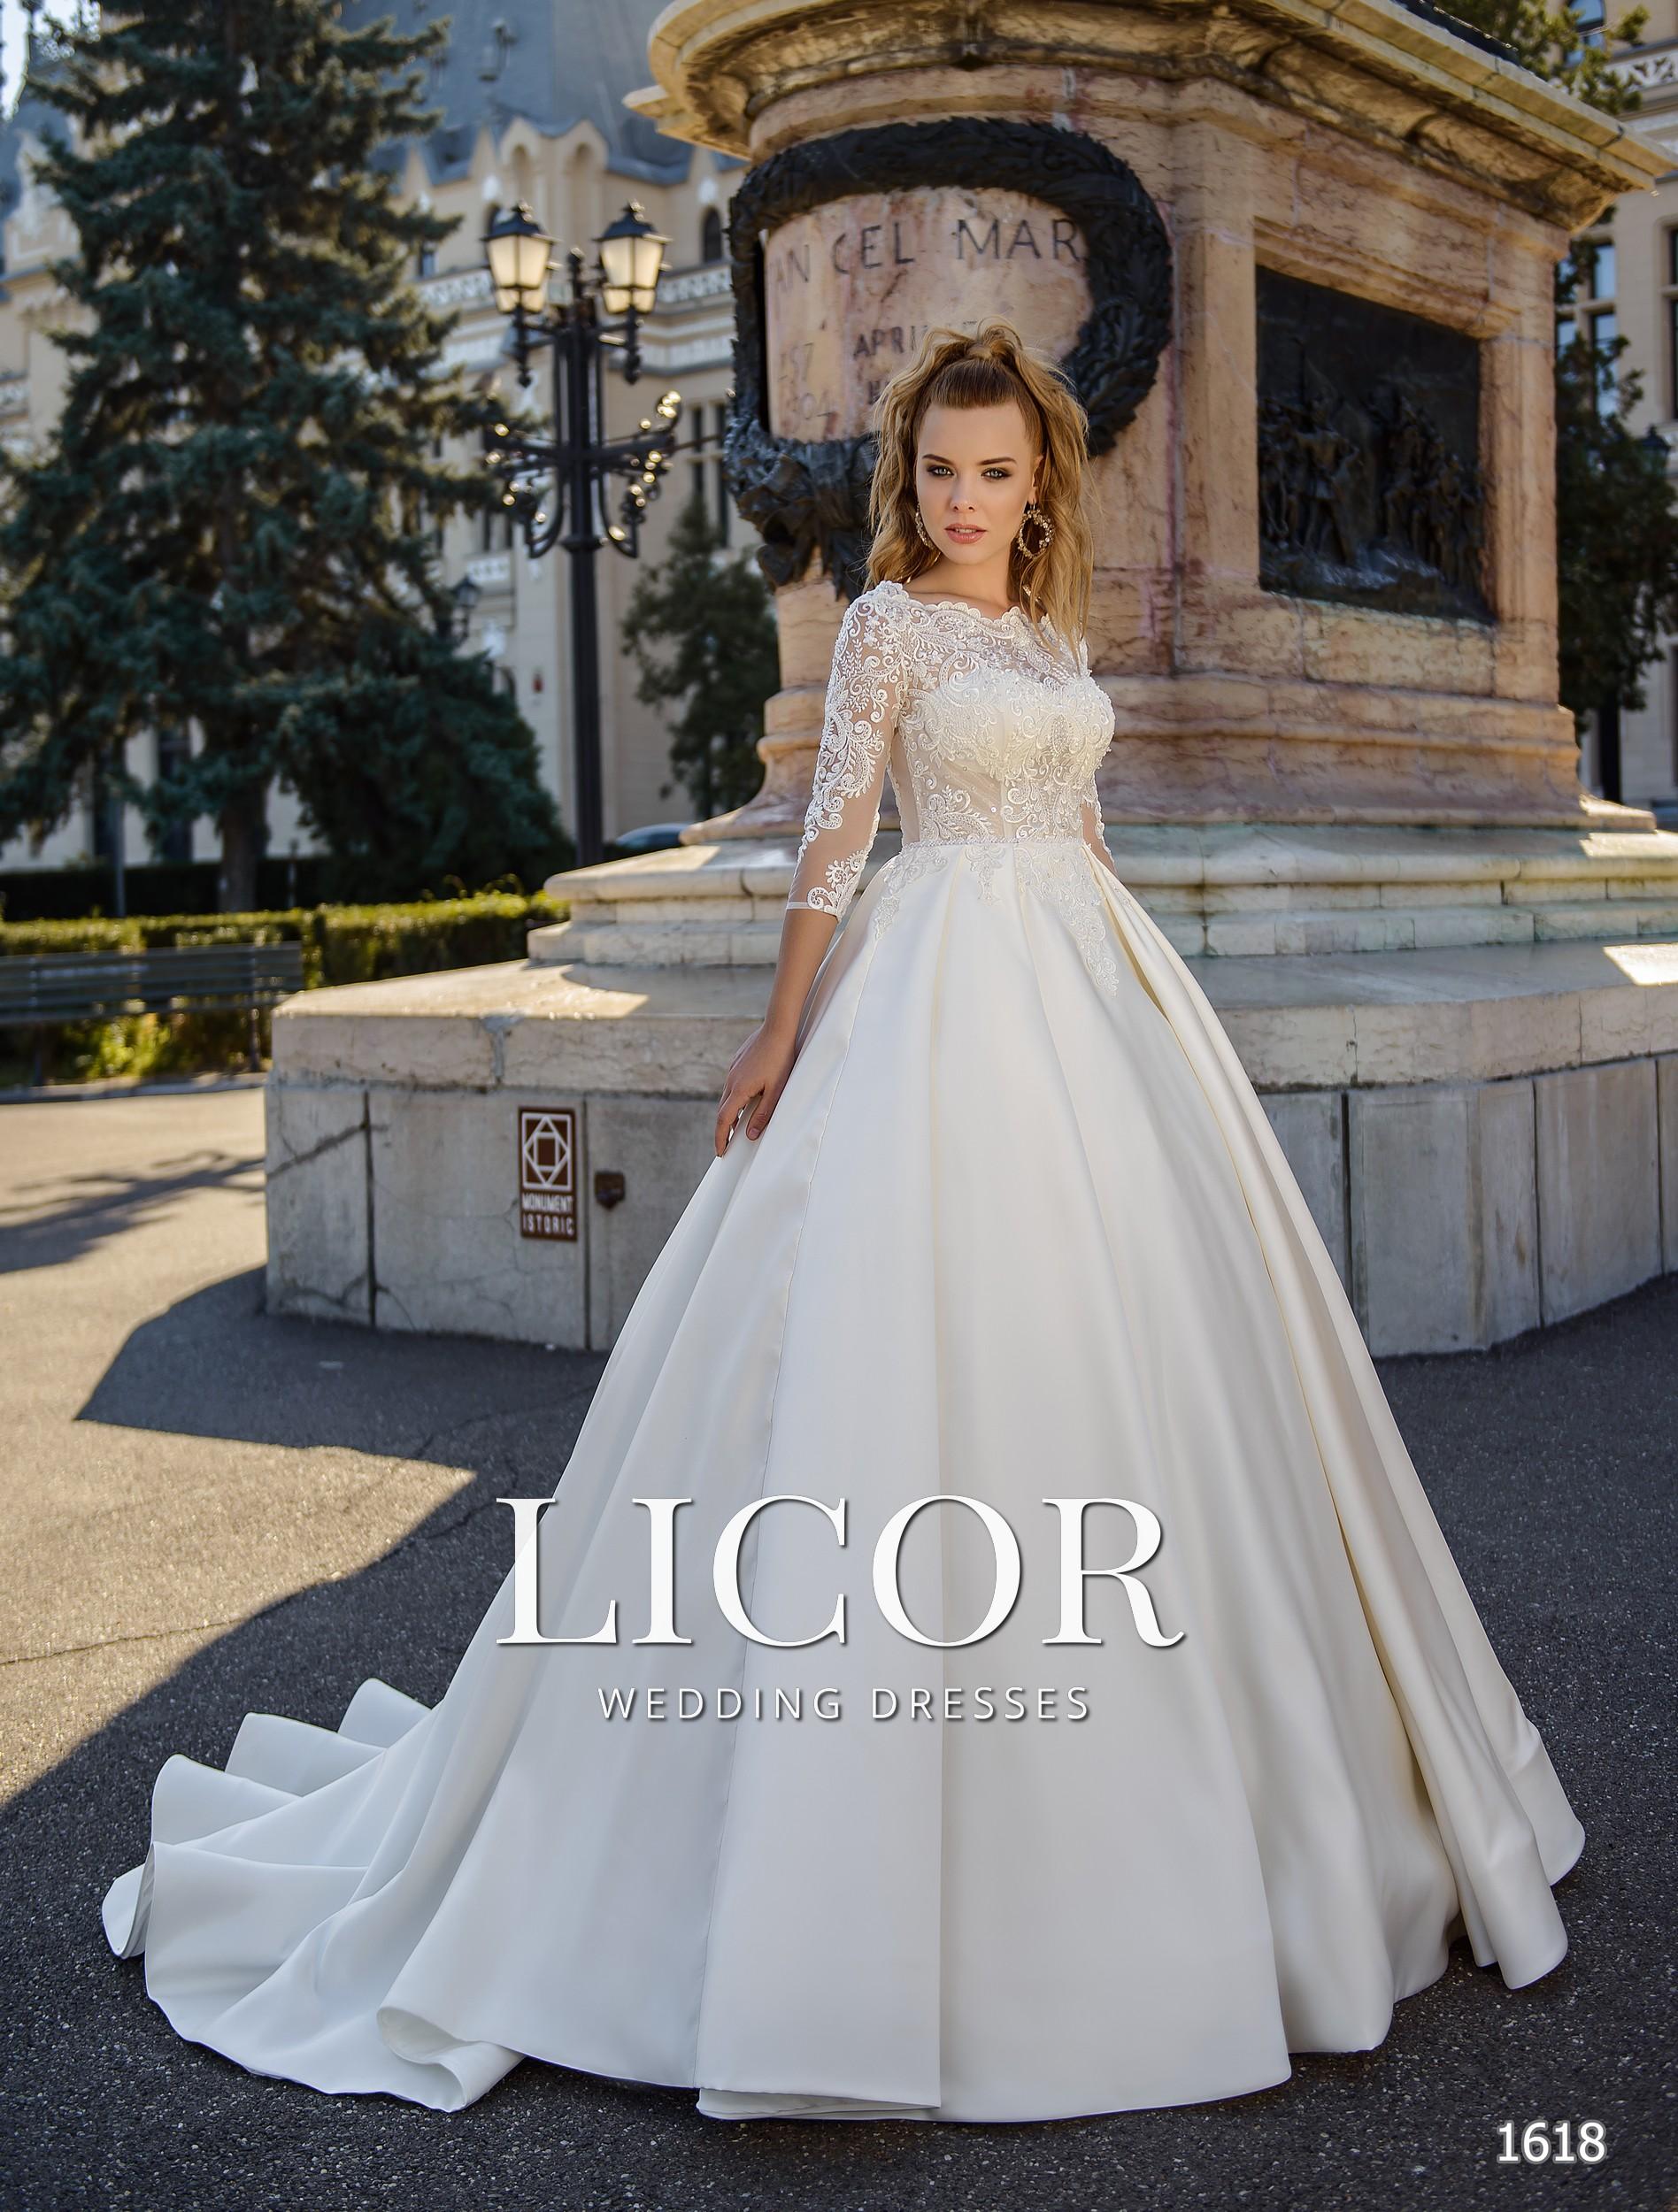 https://licor.com.ua/images/stories/virtuemart/product/1618(1).jpg